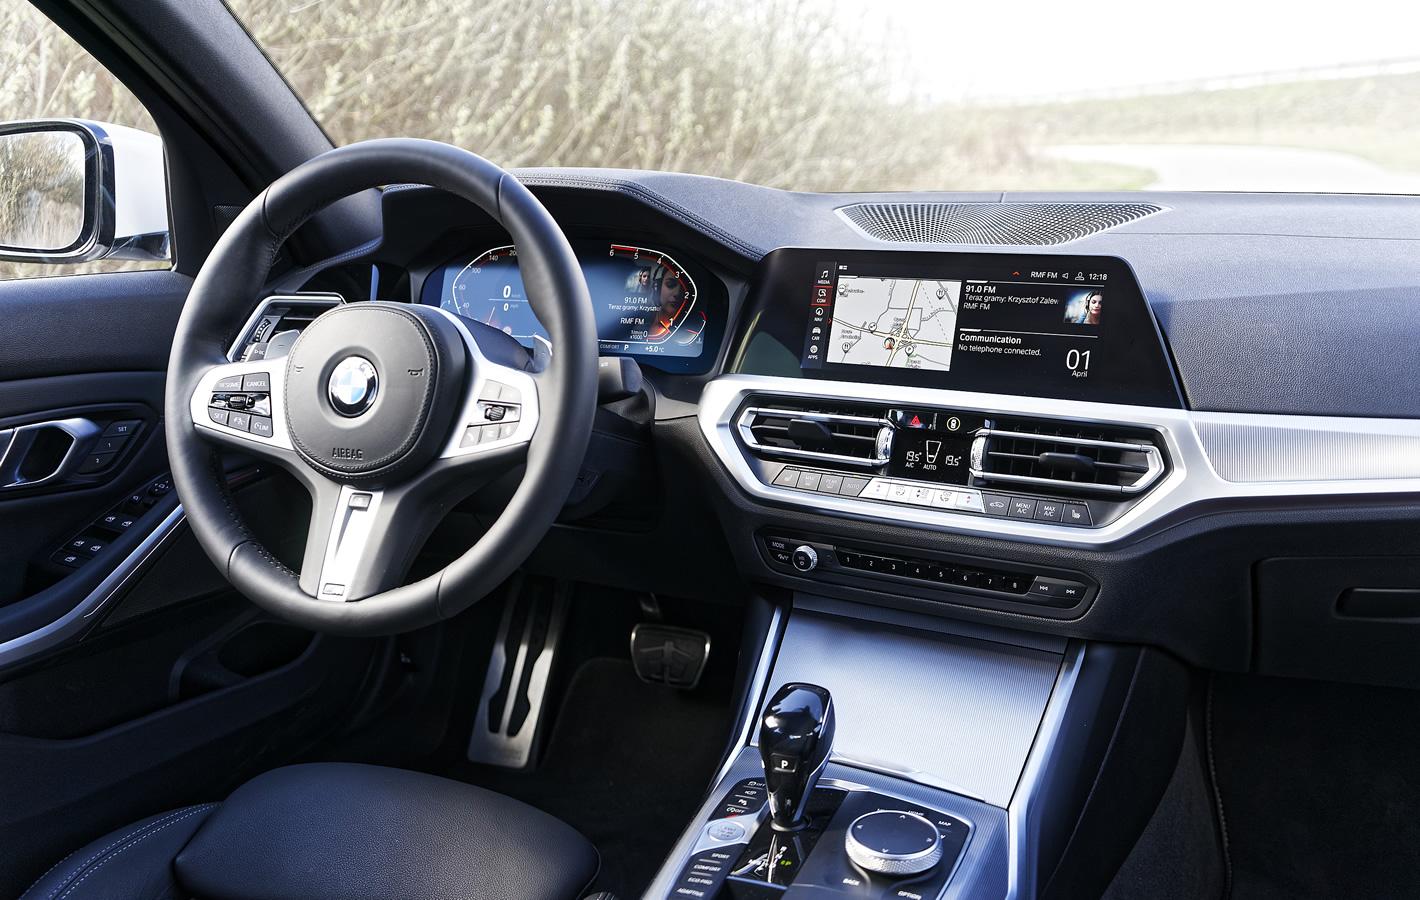 BMW 320d xDrive w środku